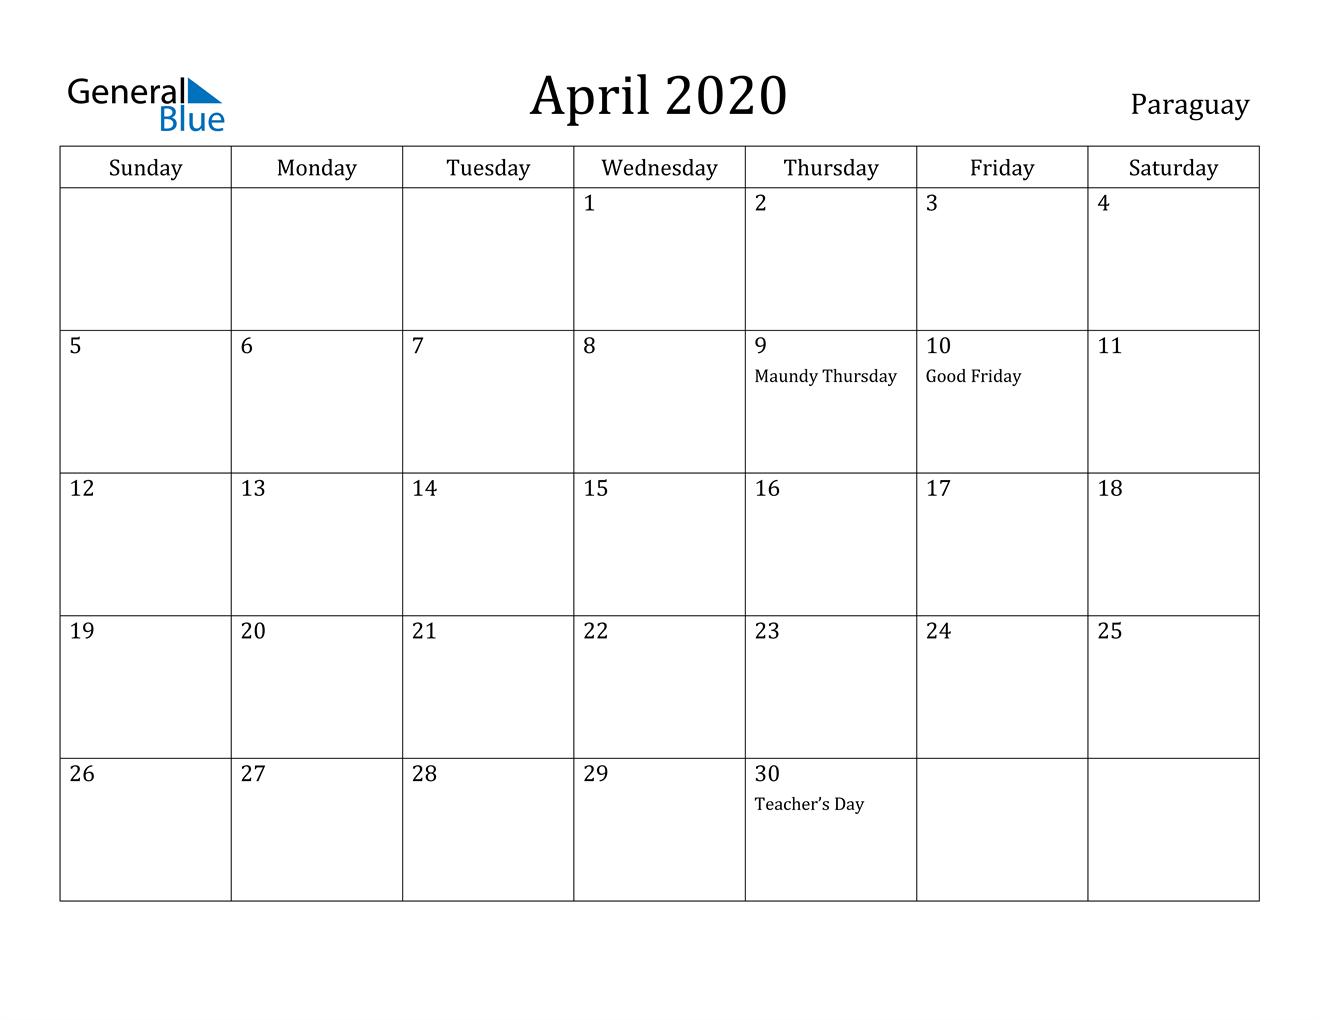 Image of April 2020 Paraguay Calendar with Holidays Calendar